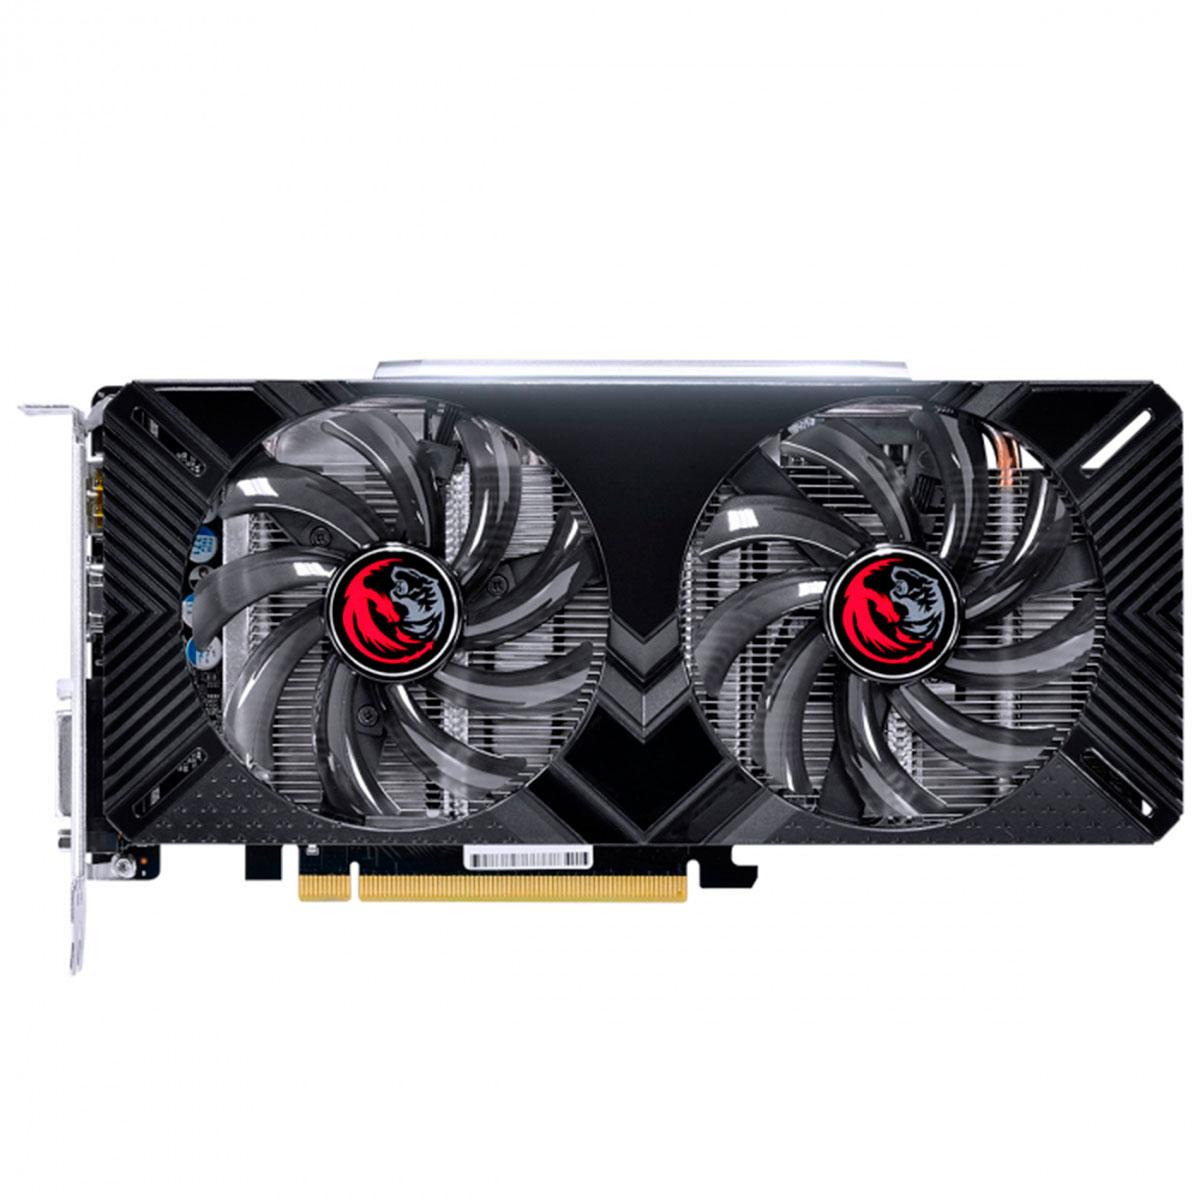 Placa de Vídeo PCYes GeForce GTX 1660 OC, 6GB, GDDR5, 192 Bits, Graffiti Series - PPOC166019206G5